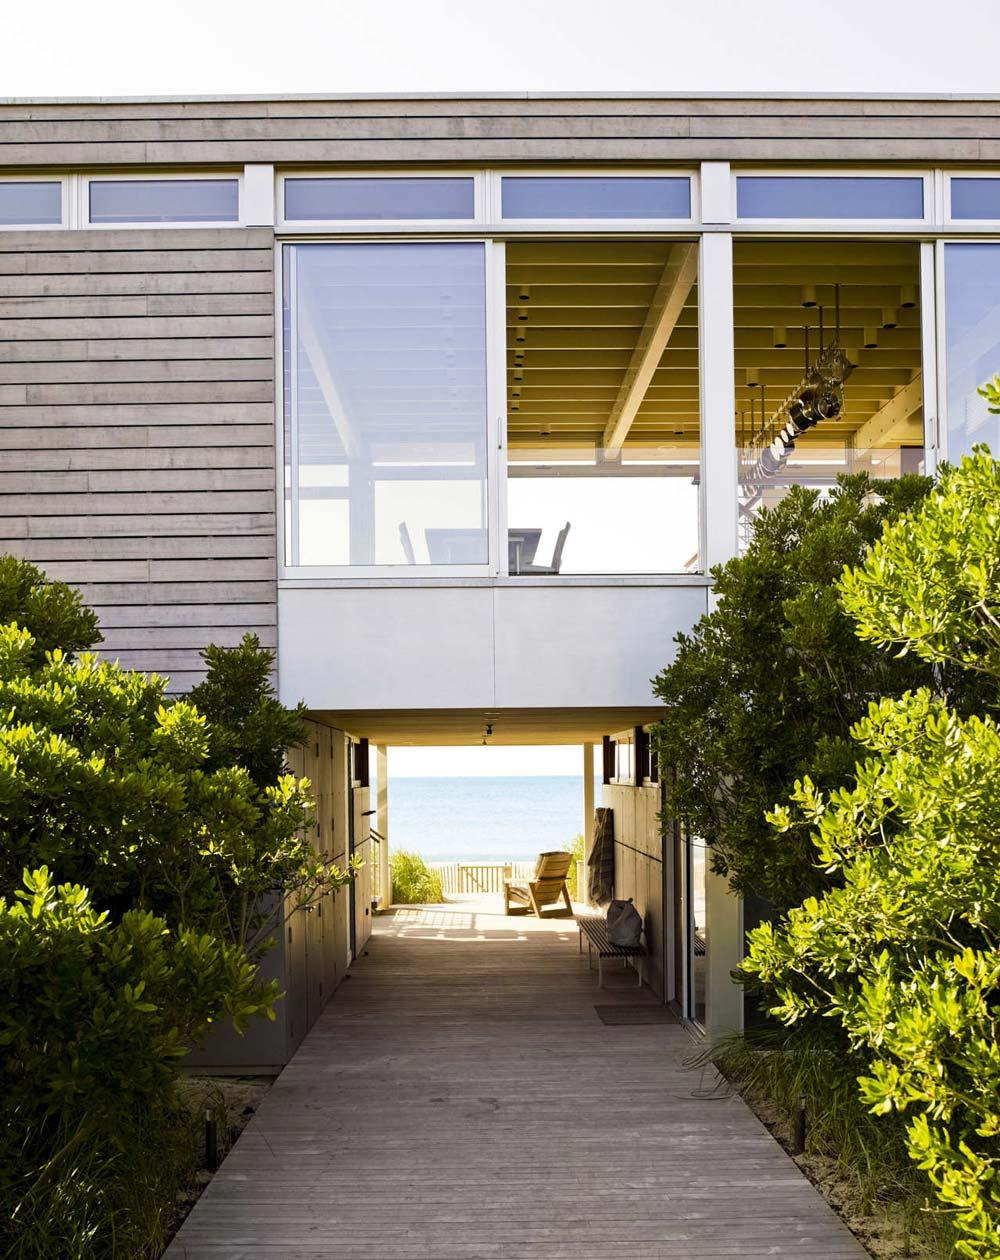 Wooden Pathway, Surfside House in Bridgehampton, New York by Stelle Architects